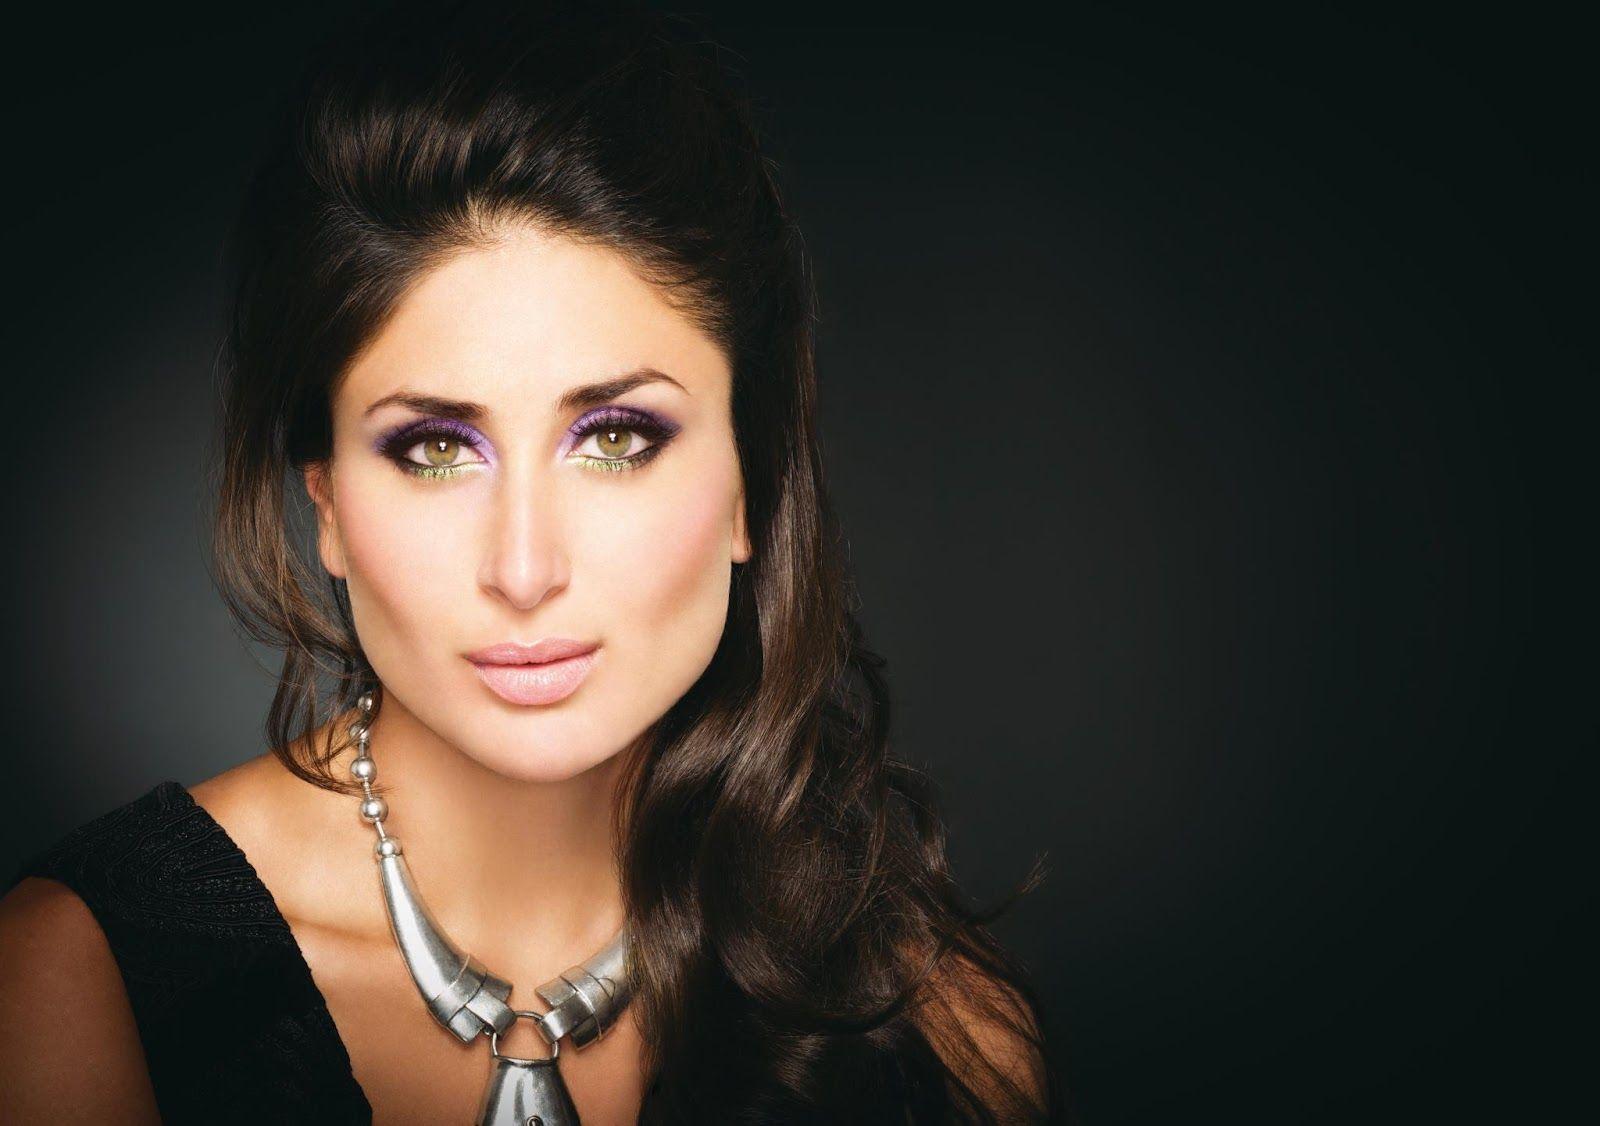 Pin By Snehal Nandagawli On Glamour Me Up Kareena Kapoor Beautiful Face Kareena Kapoor Khan